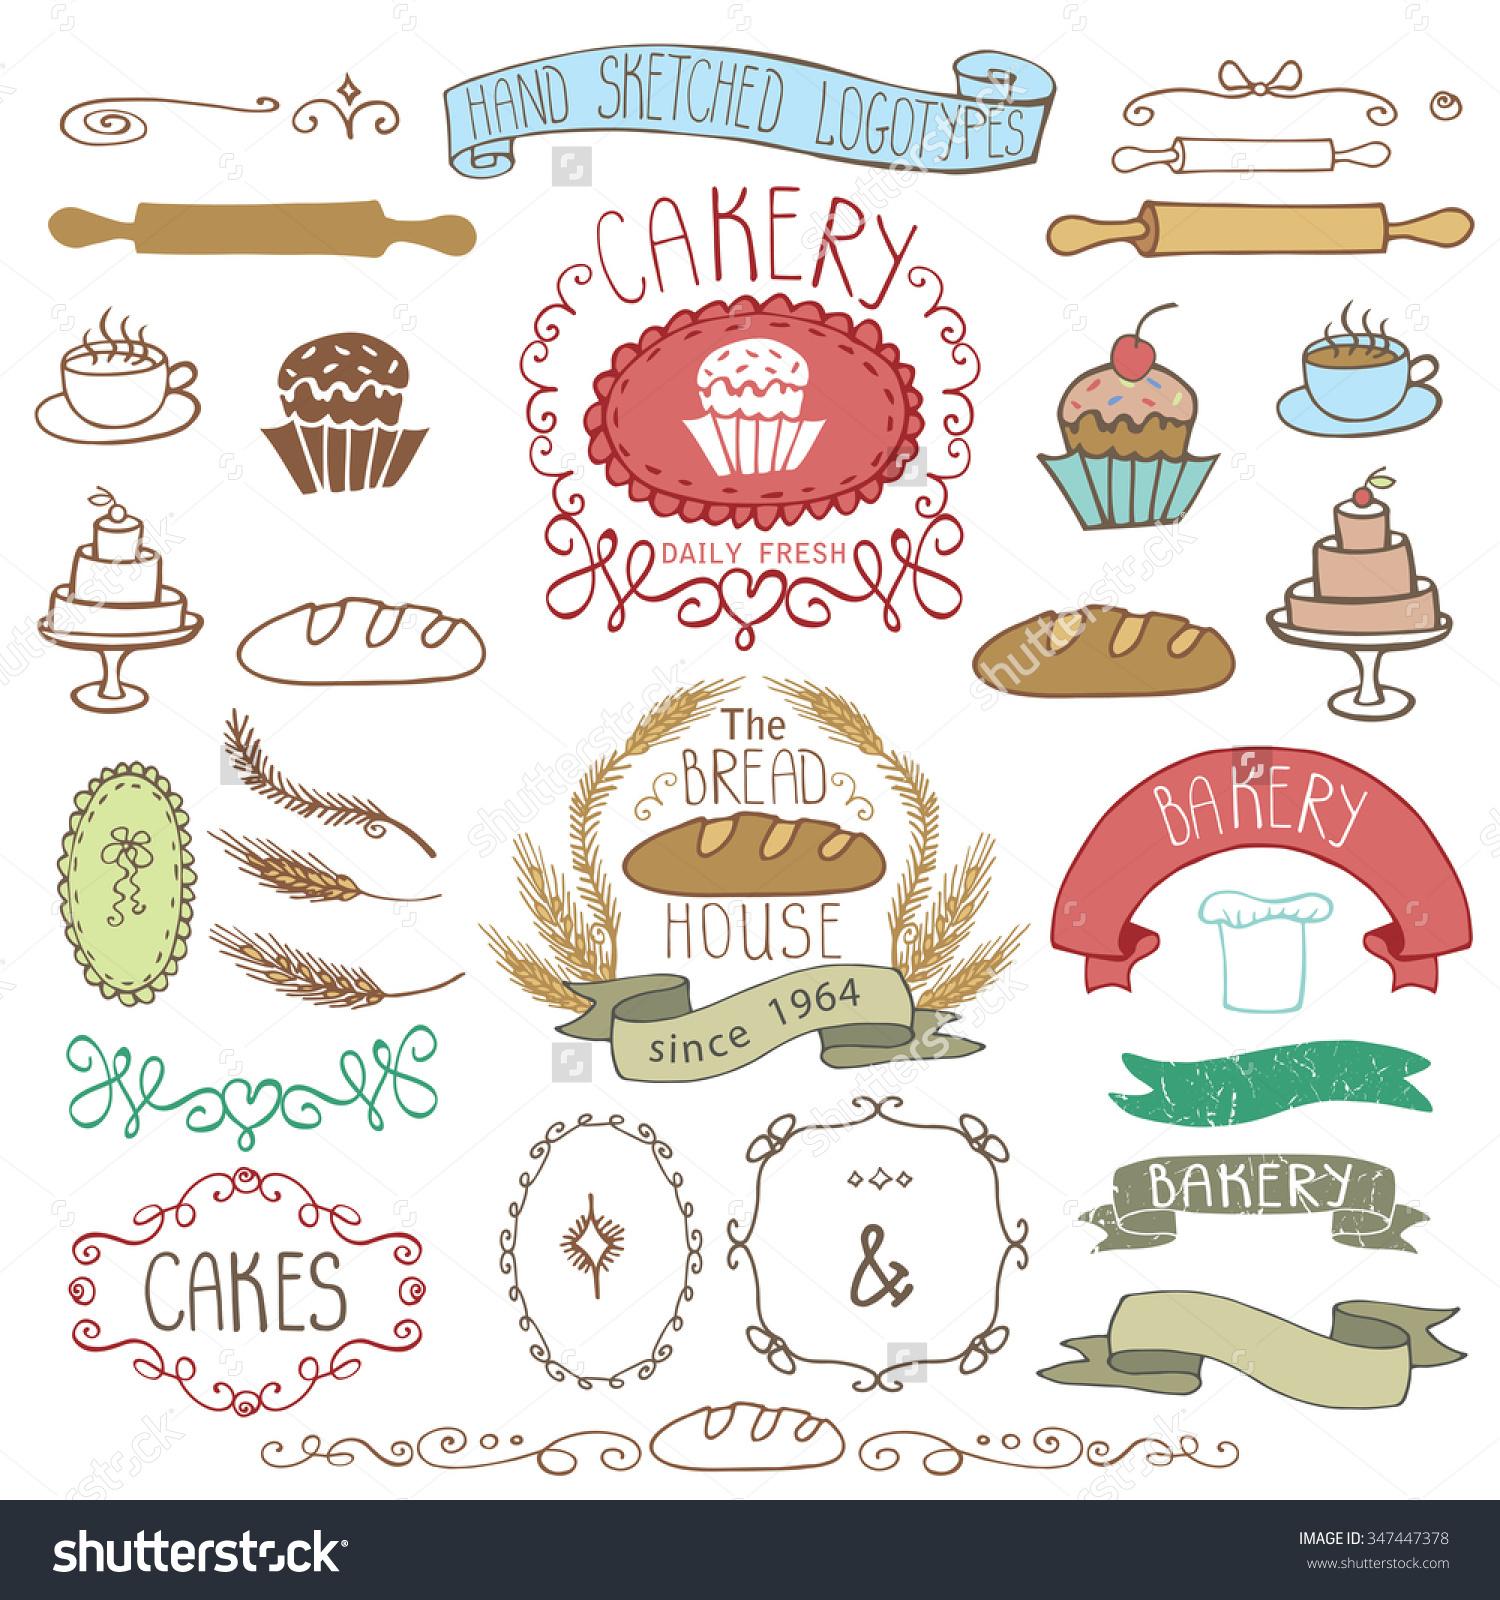 Retro clip art creator free Vintage Retro Bakery Badgeslabelslogoscolored Hand Sketched Stock ... free